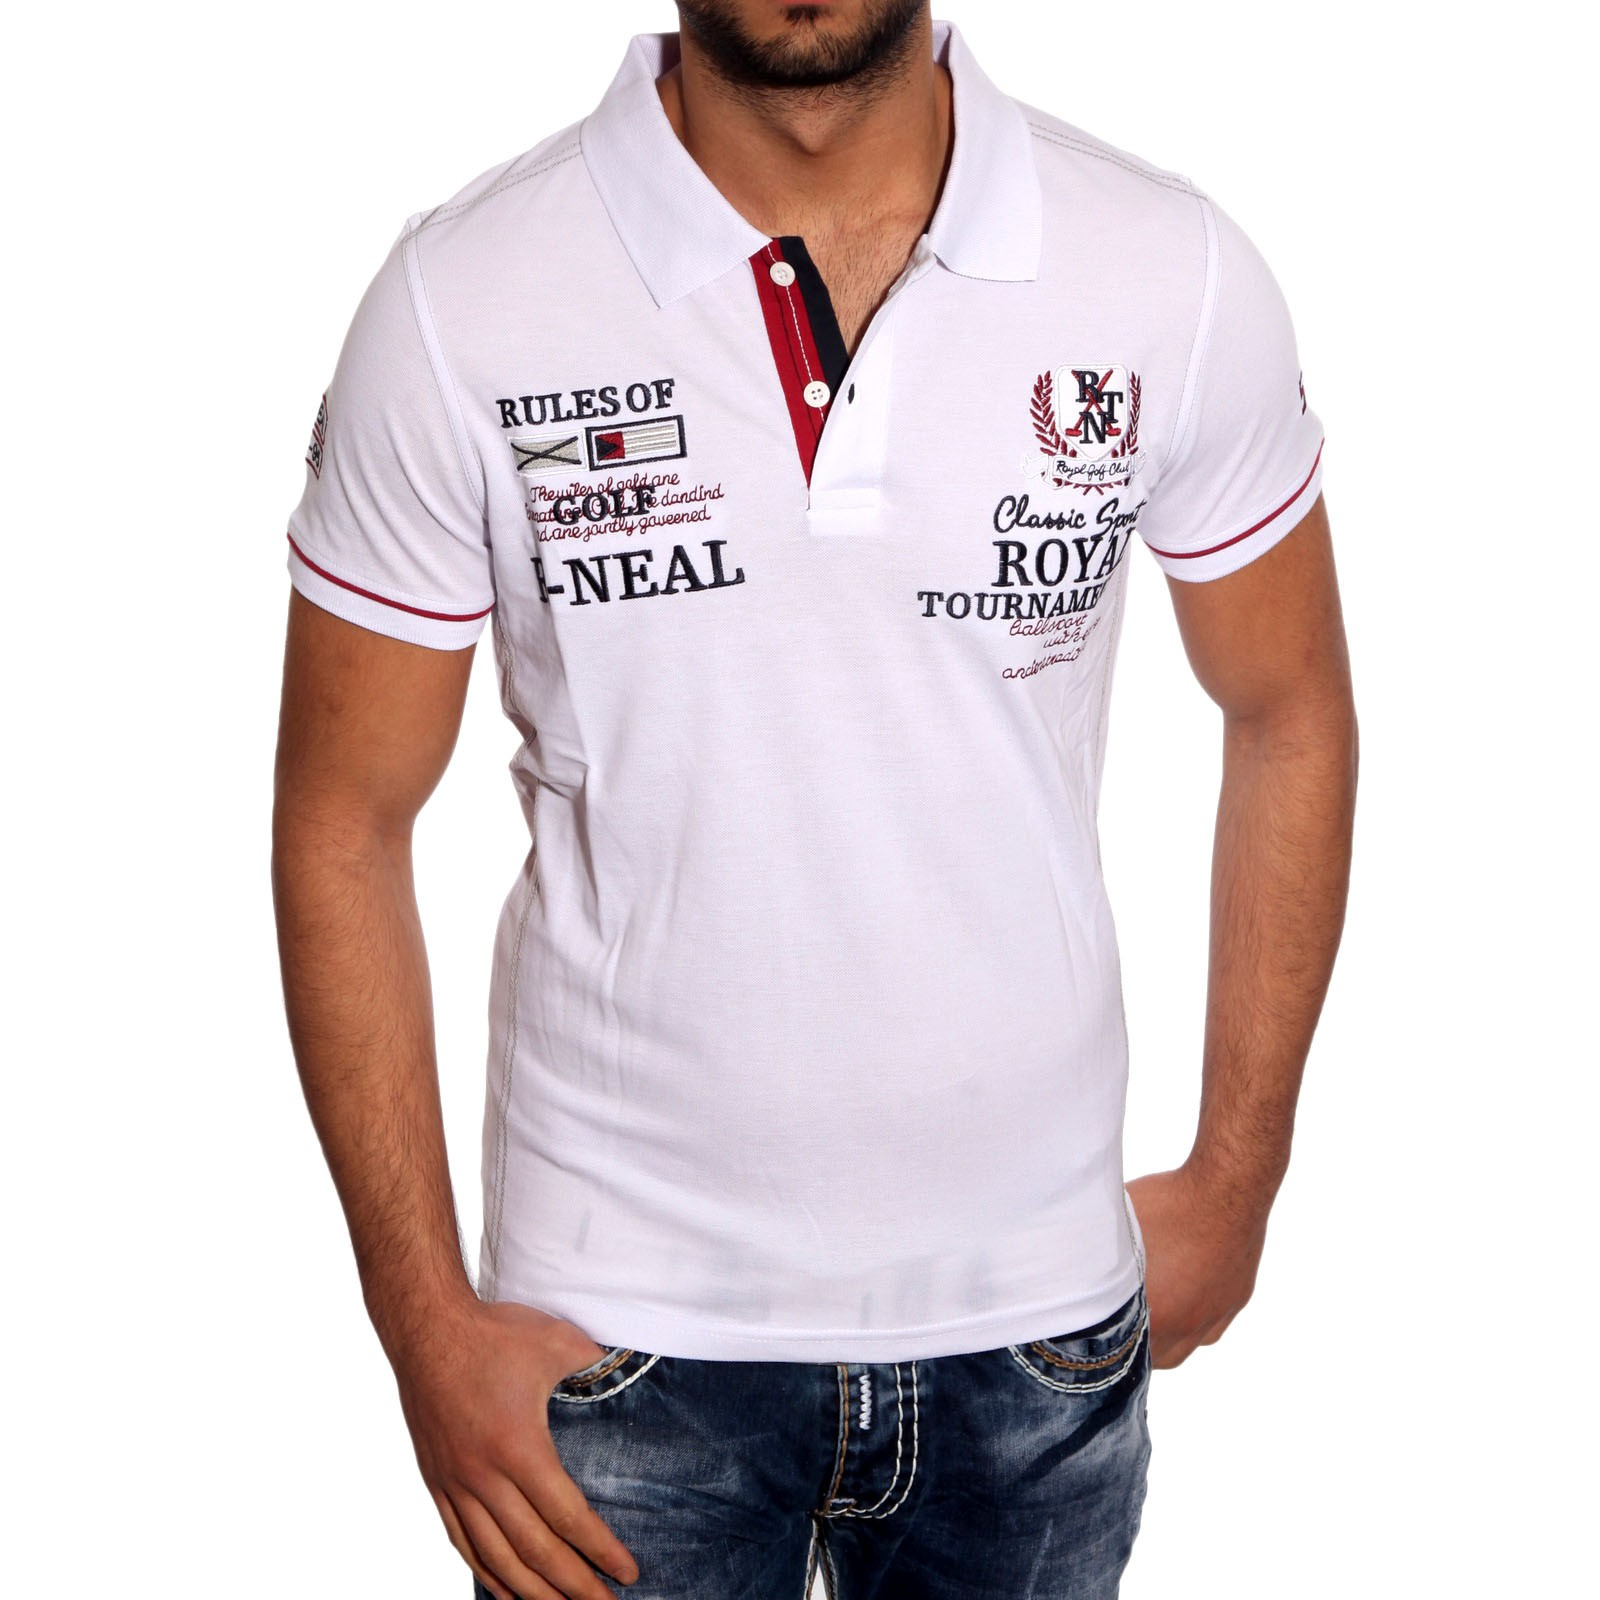 Poloshirt 6616 R-Neal